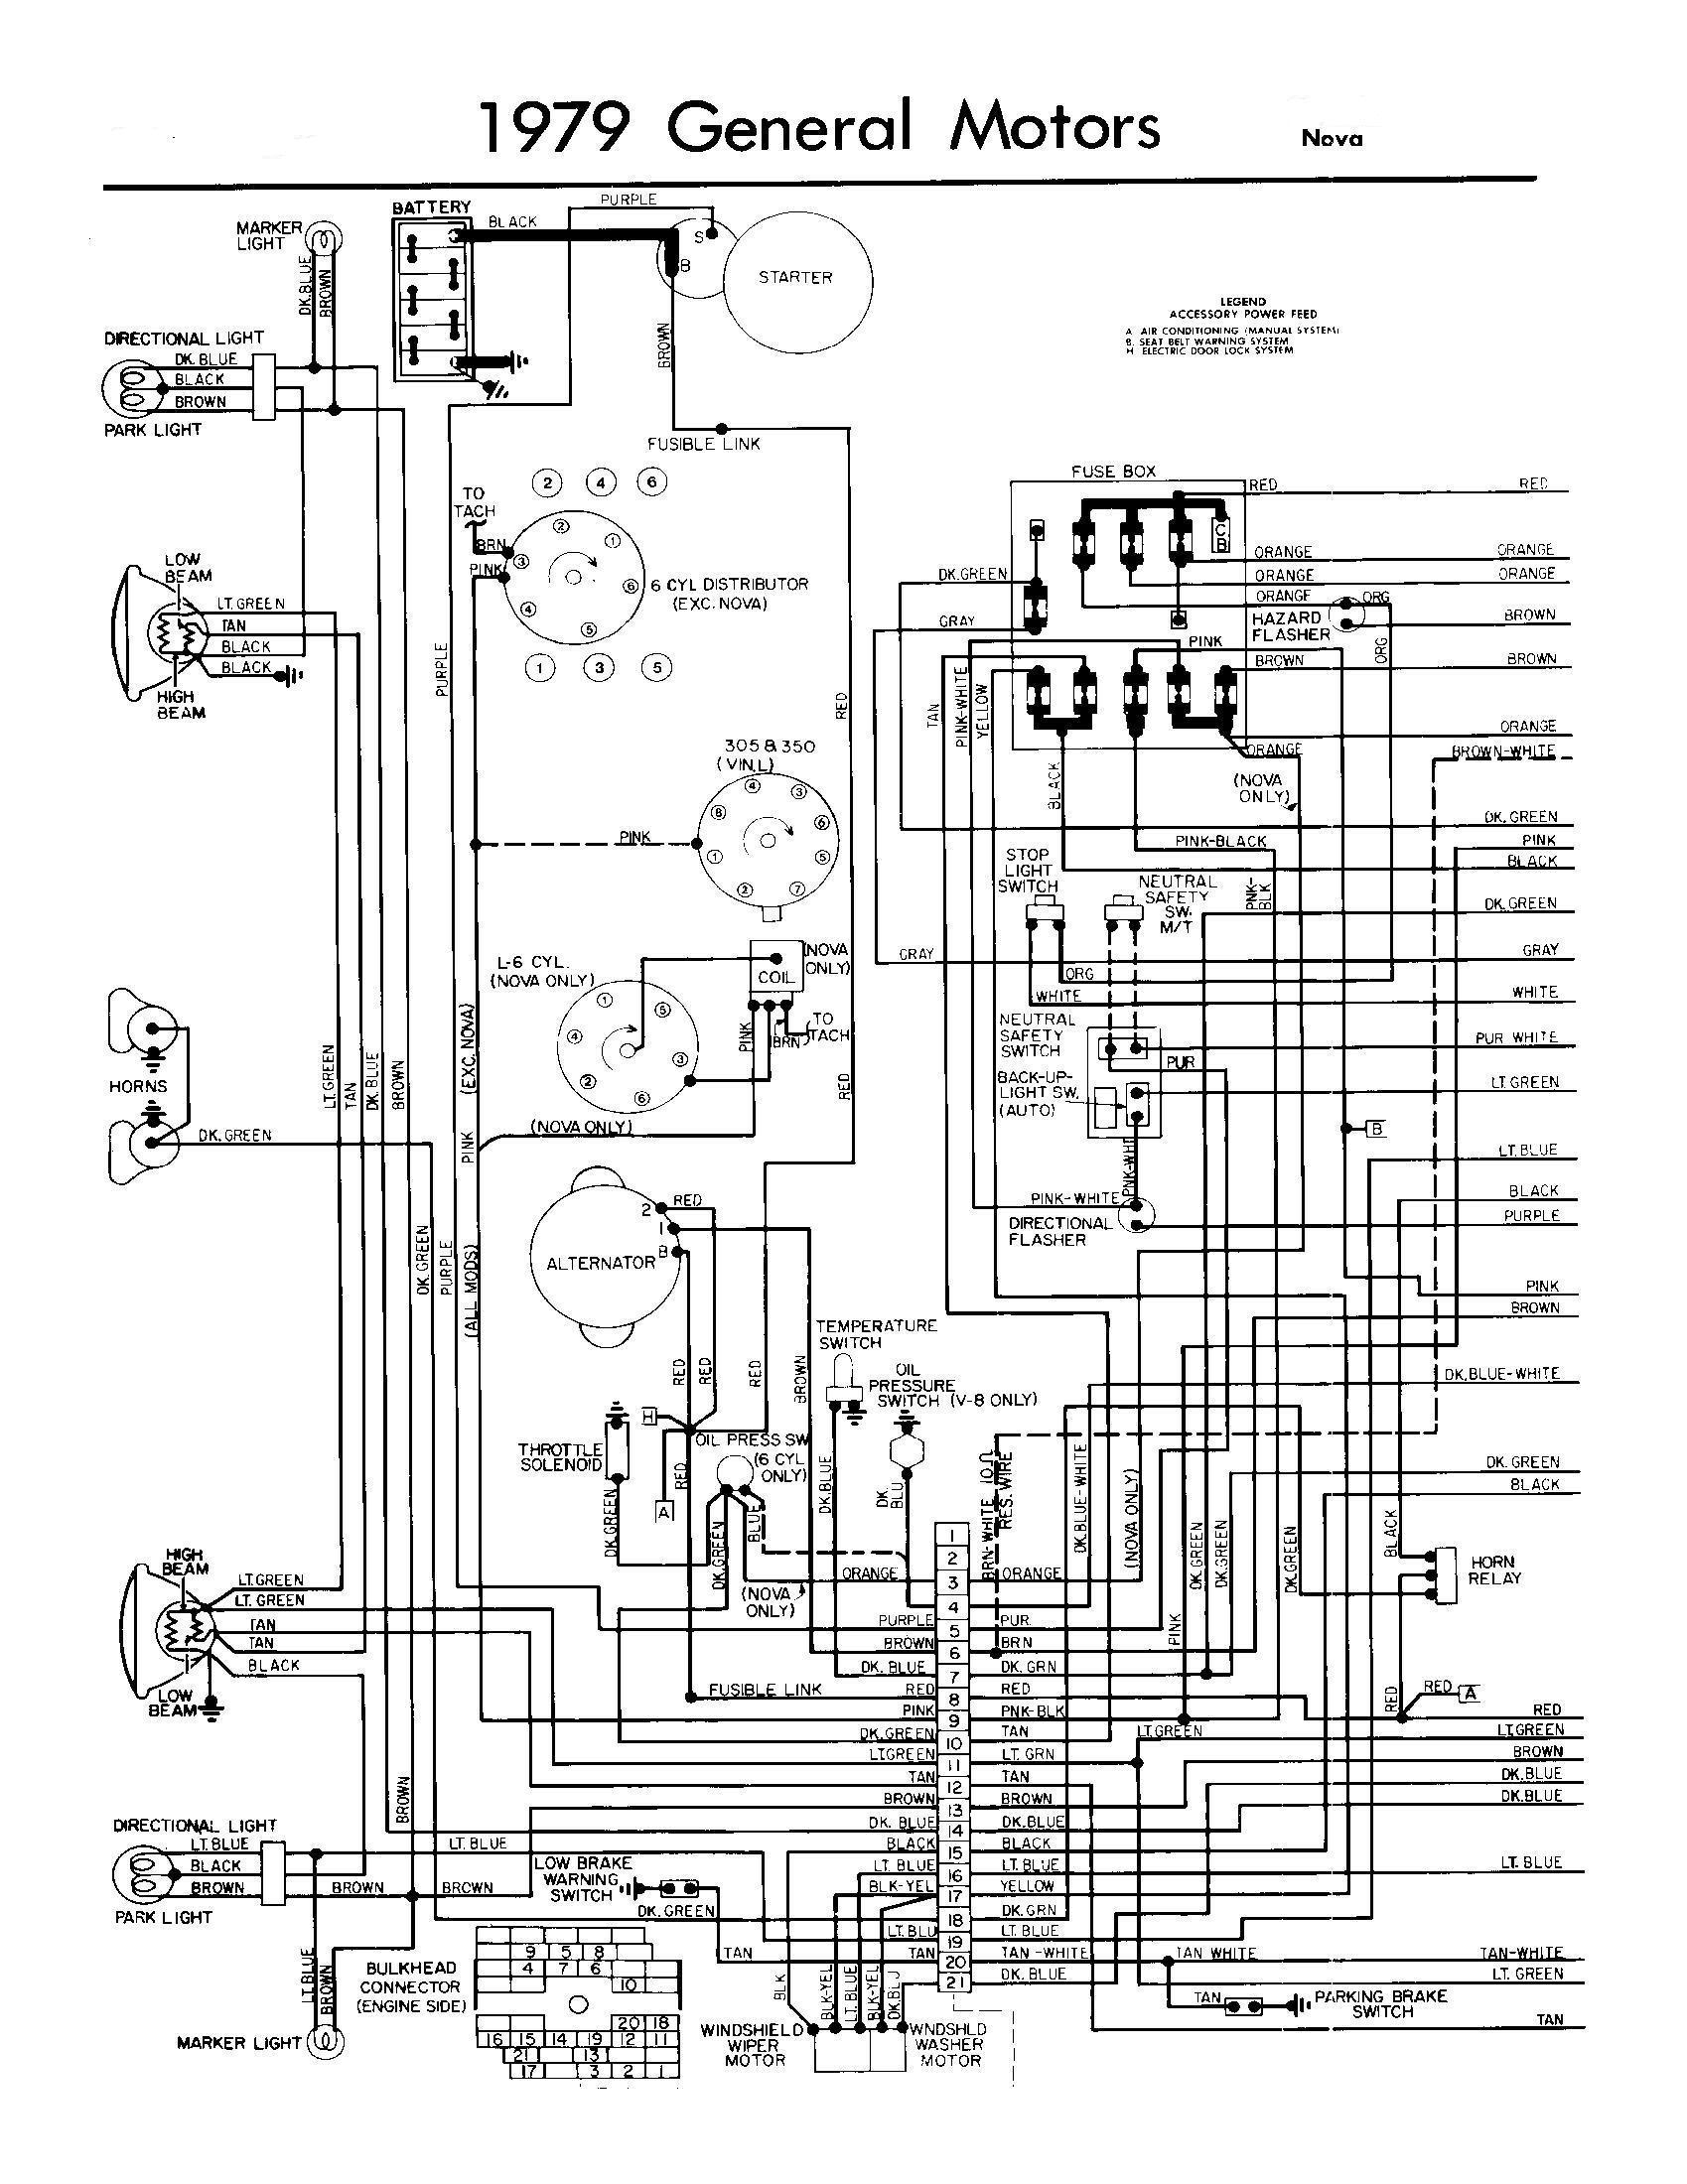 78 Chevy C10 Wiring Diagram - All Wiring Diagram Data - Chevy Starter Wiring Diagram